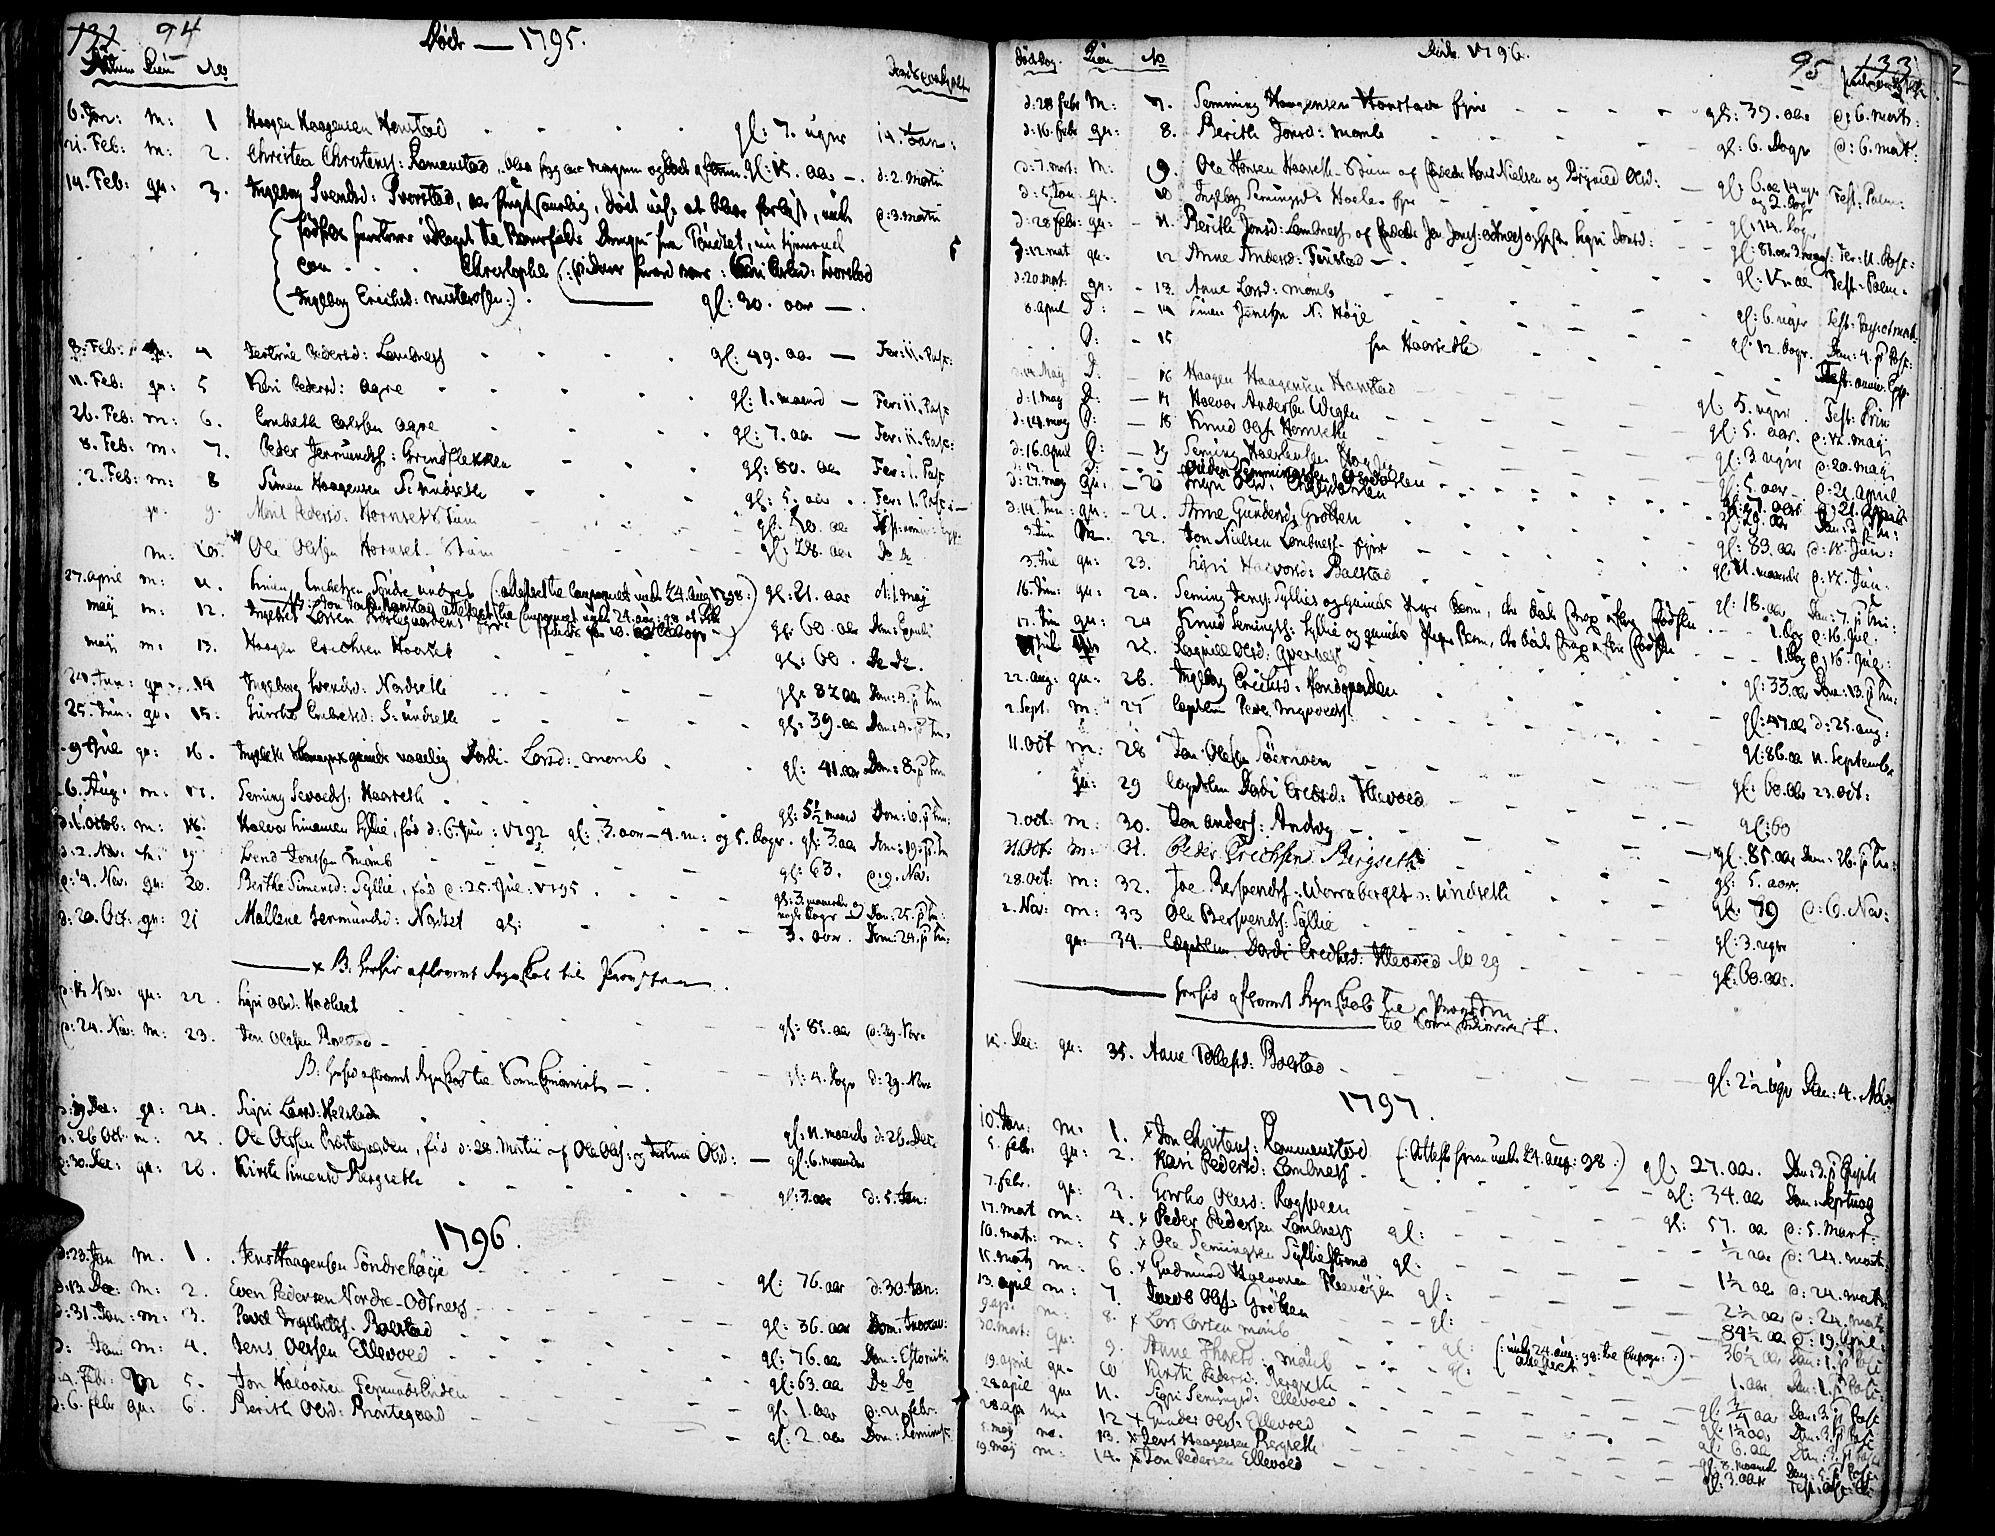 SAH, Rendalen prestekontor, H/Ha/Haa/L0002: Ministerialbok nr. 2, 1788-1814, s. 94-95